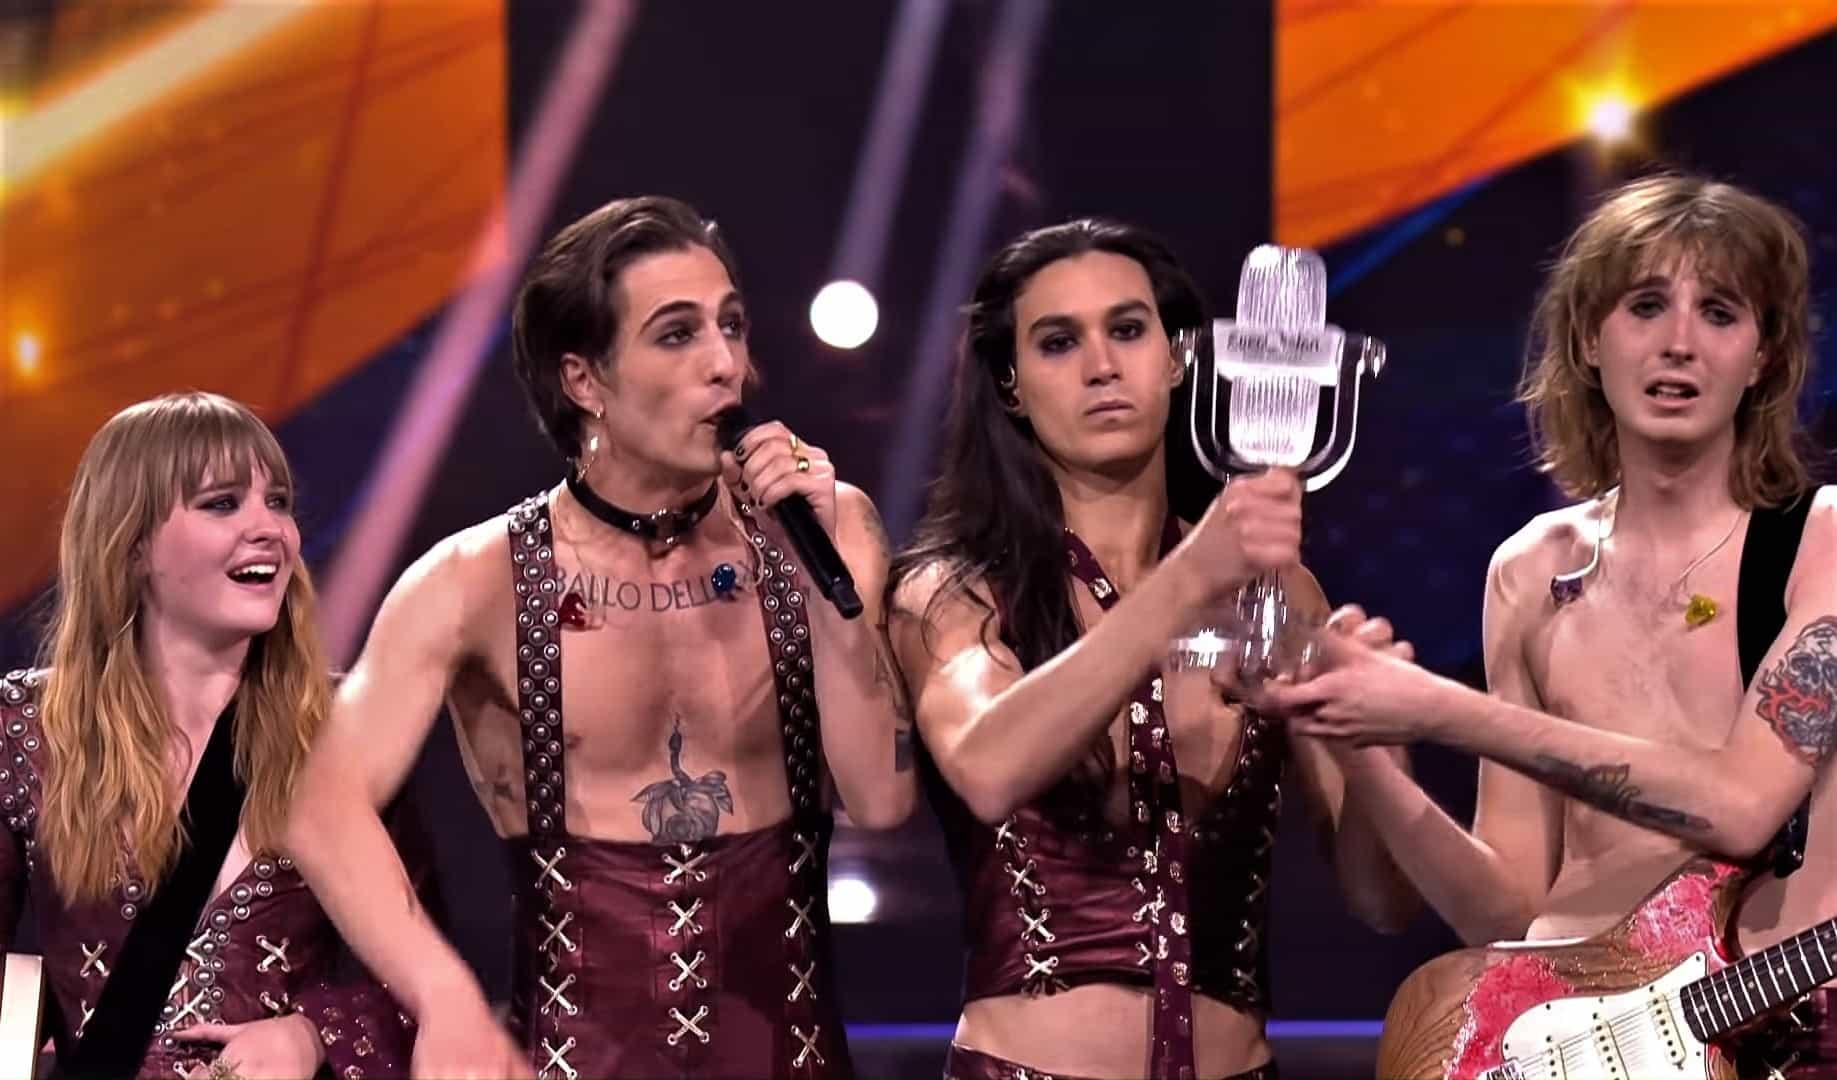 https://cursorinfo.co.il/wp-content/uploads/2021/05/Maneskin-Zitti-E-Buoni-Winners-Performance-Italy-Eurovision-2021-0-49-screenshot-1.jpg